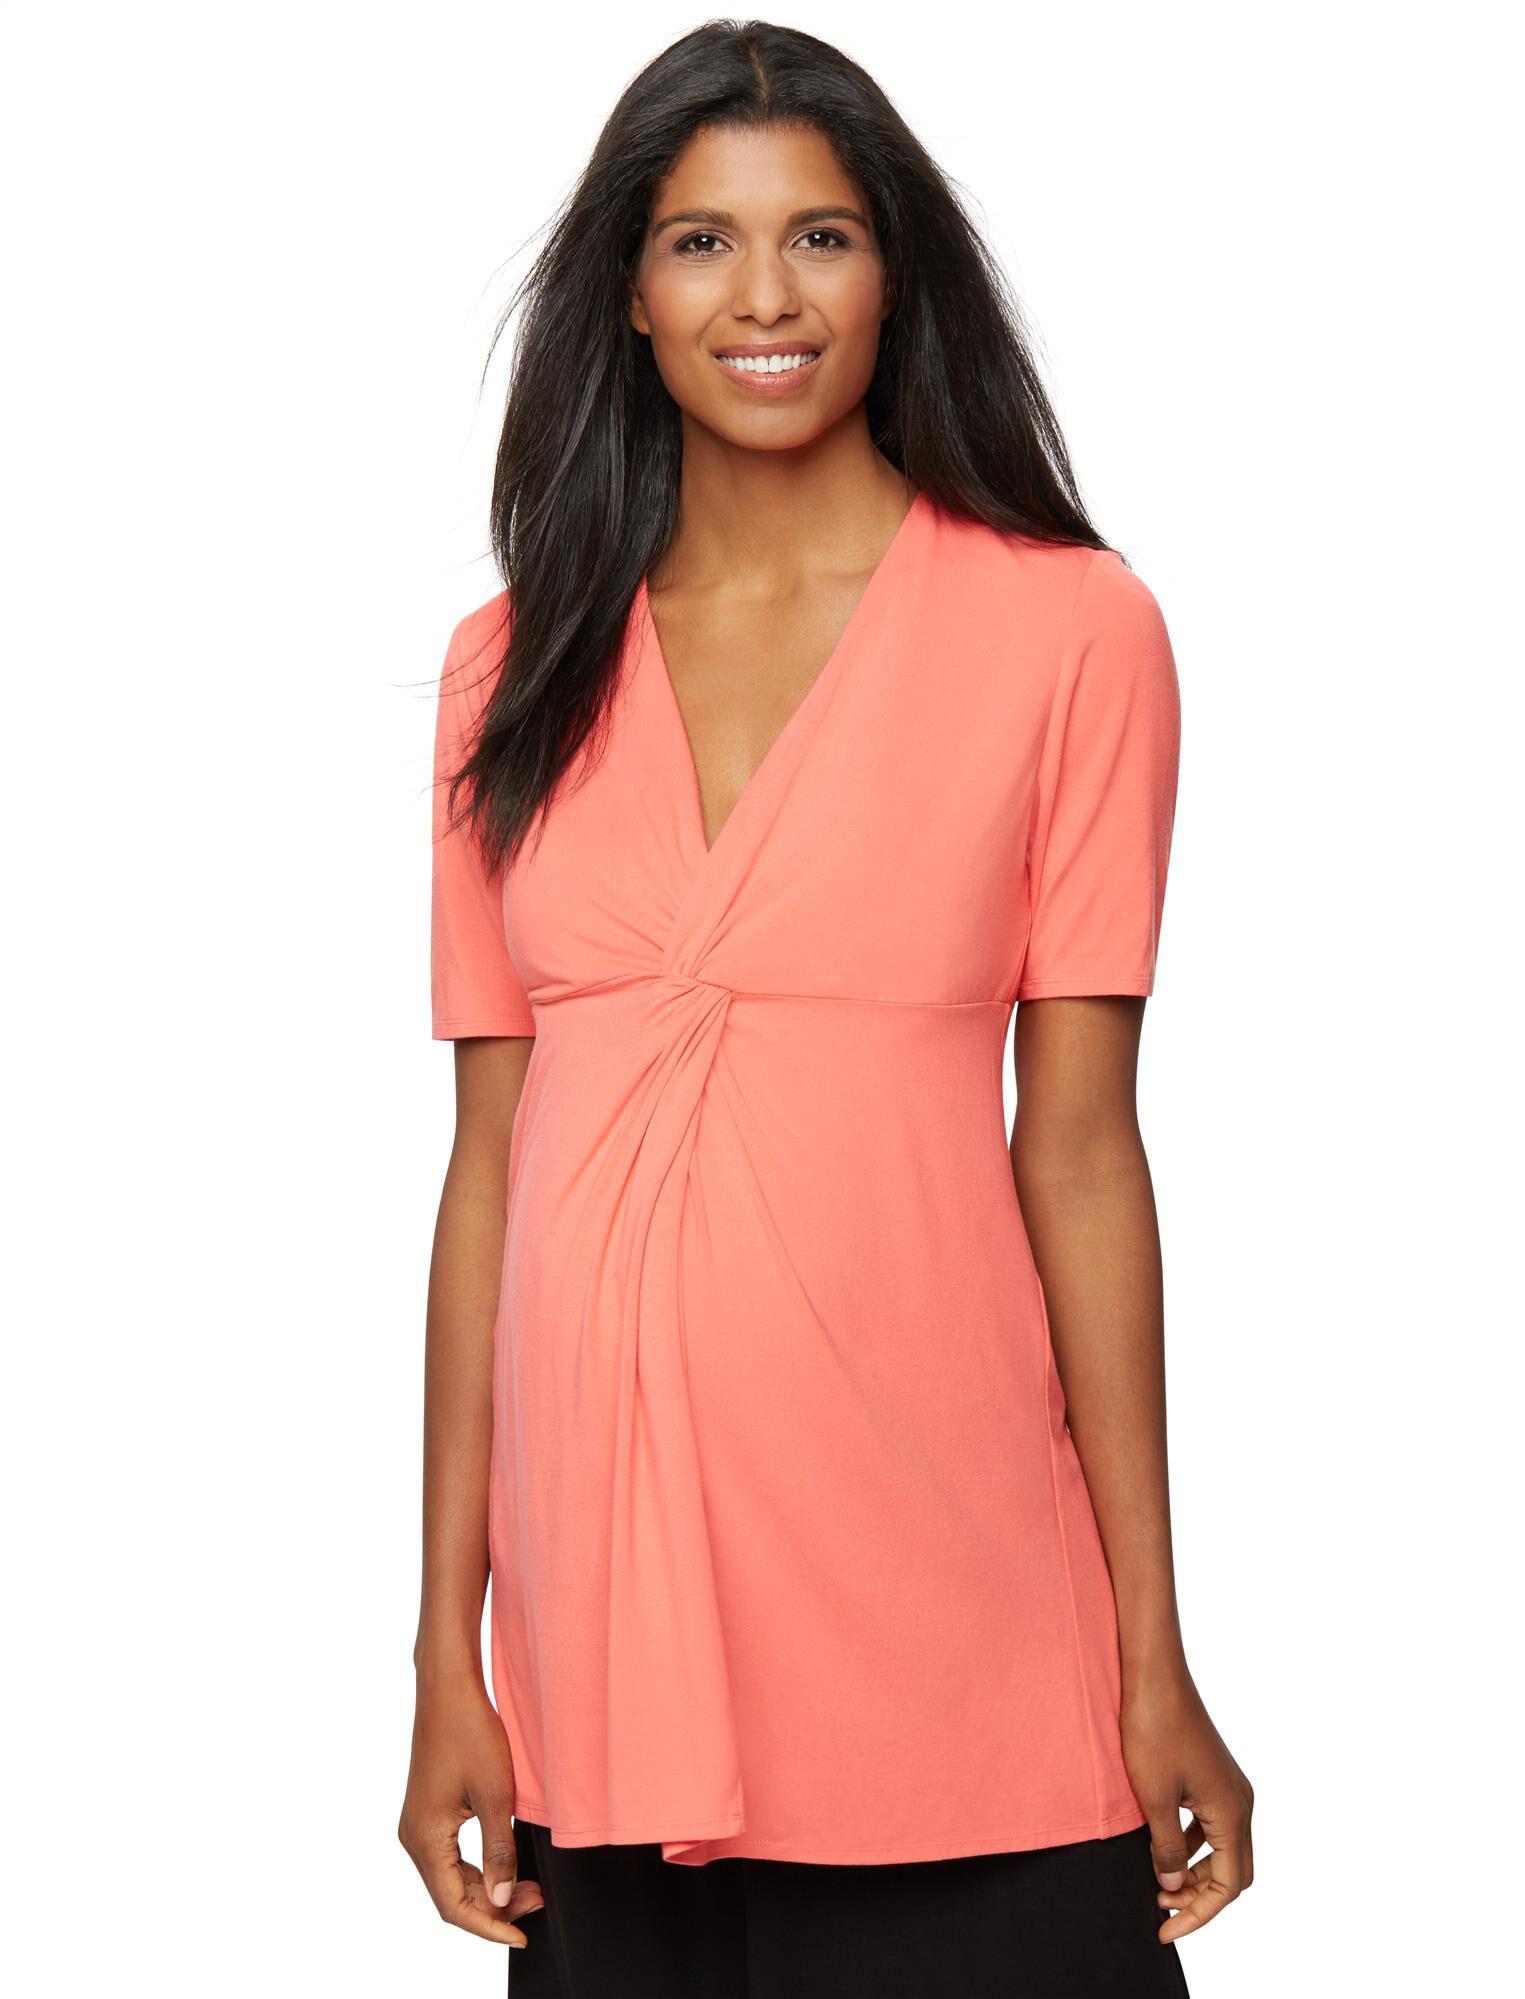 Rachel Zoe Soft Jersey Knit Maternity Top